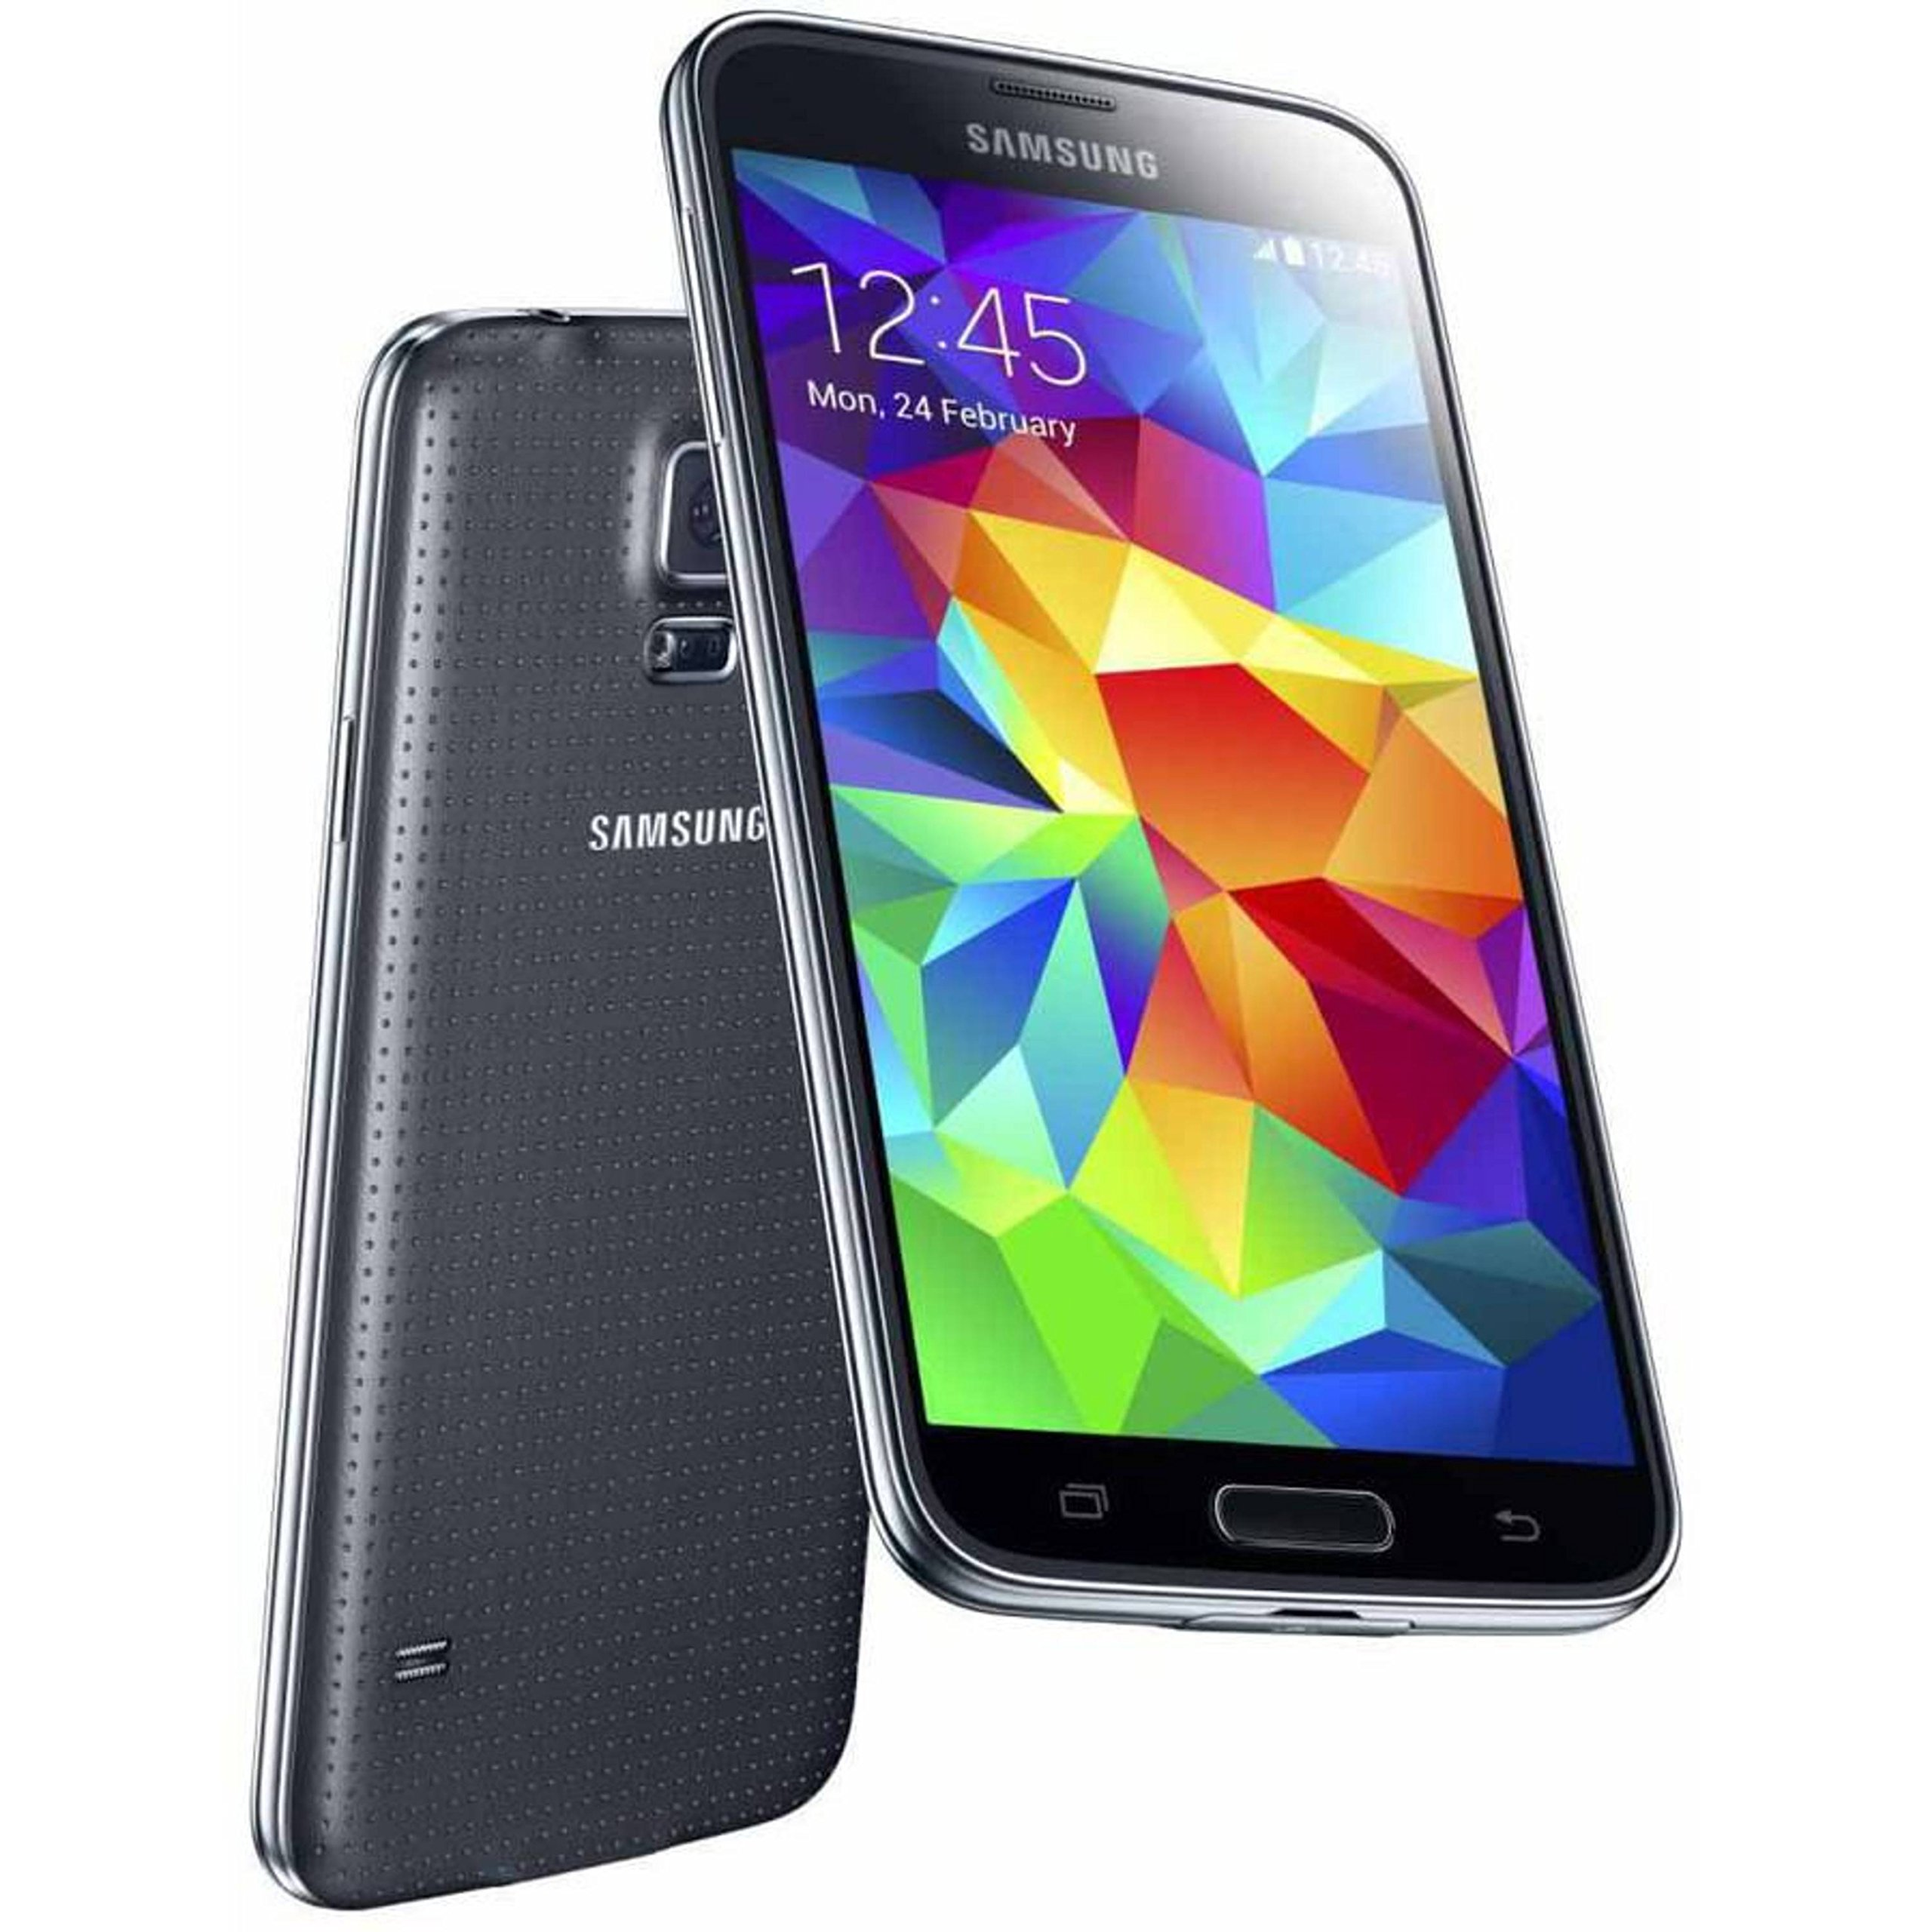 Samsung SM-G900V - Galaxy S5 - 16GB Android Smartphone Verizon  - Black (Renewed) by Samsung